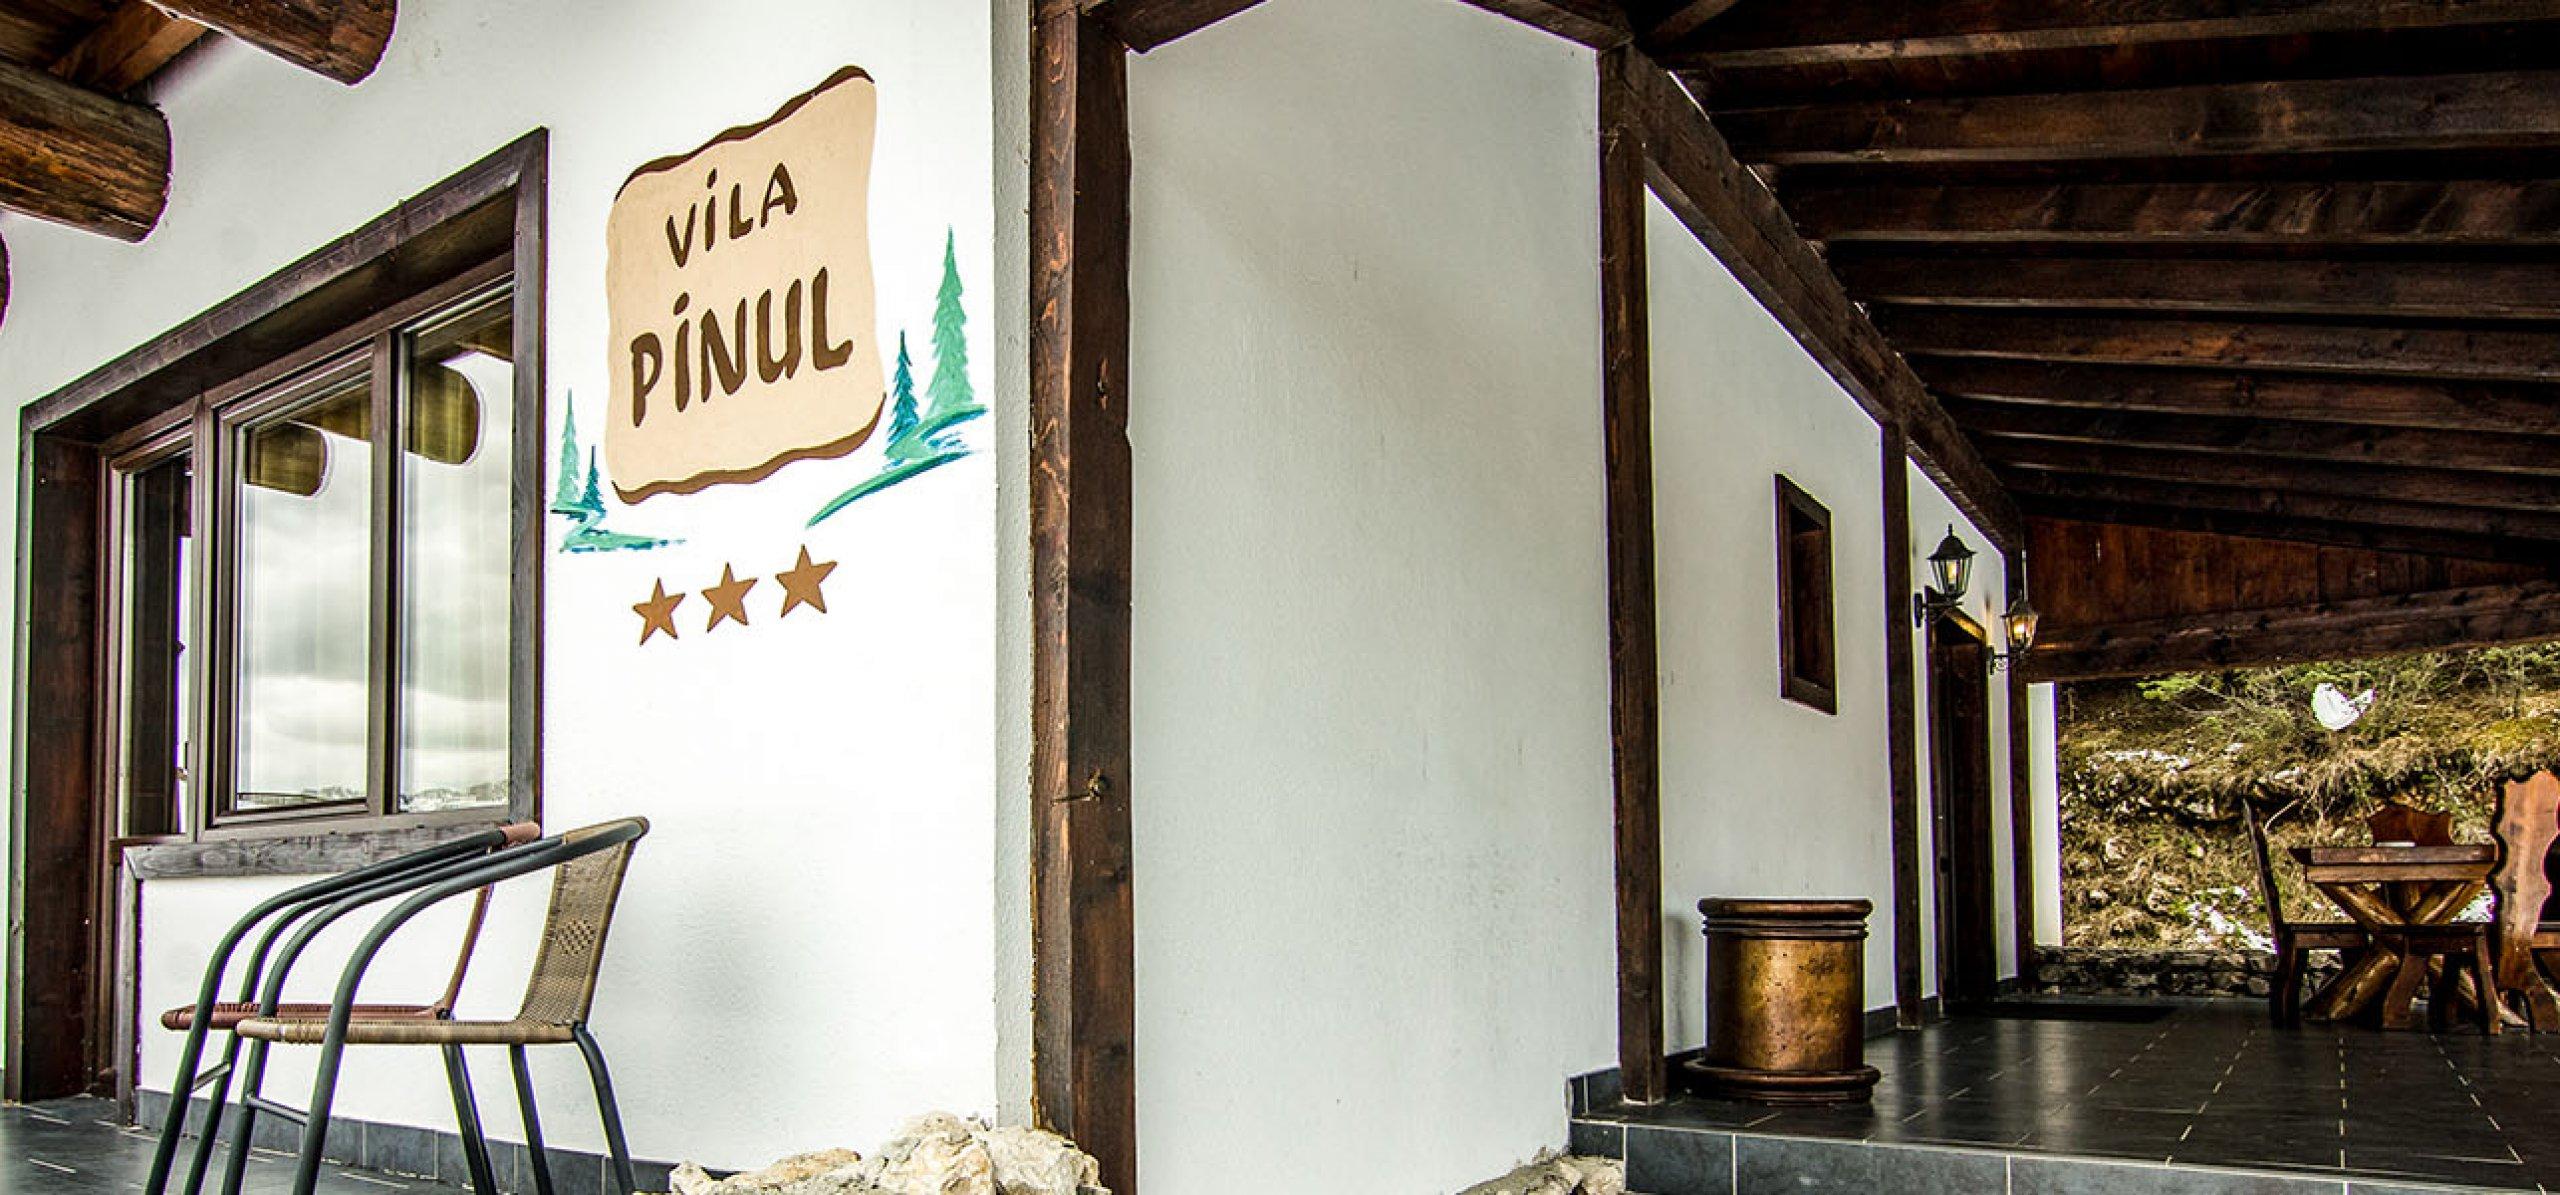 Vila Pinul g 2